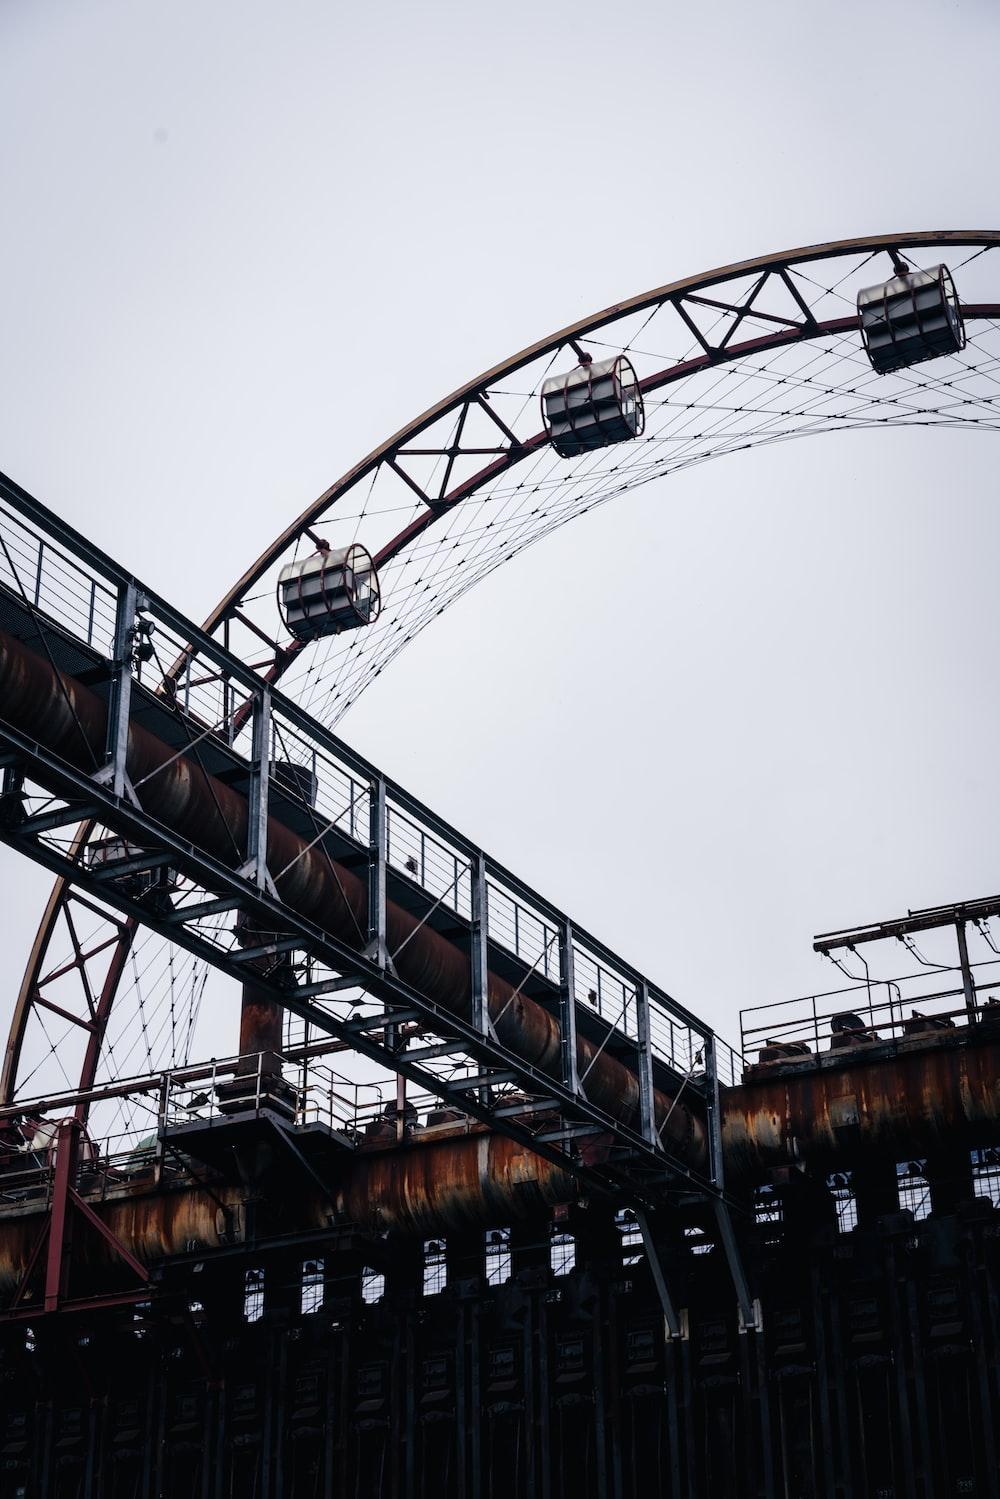 brown and black metal bridge under white sky during daytime